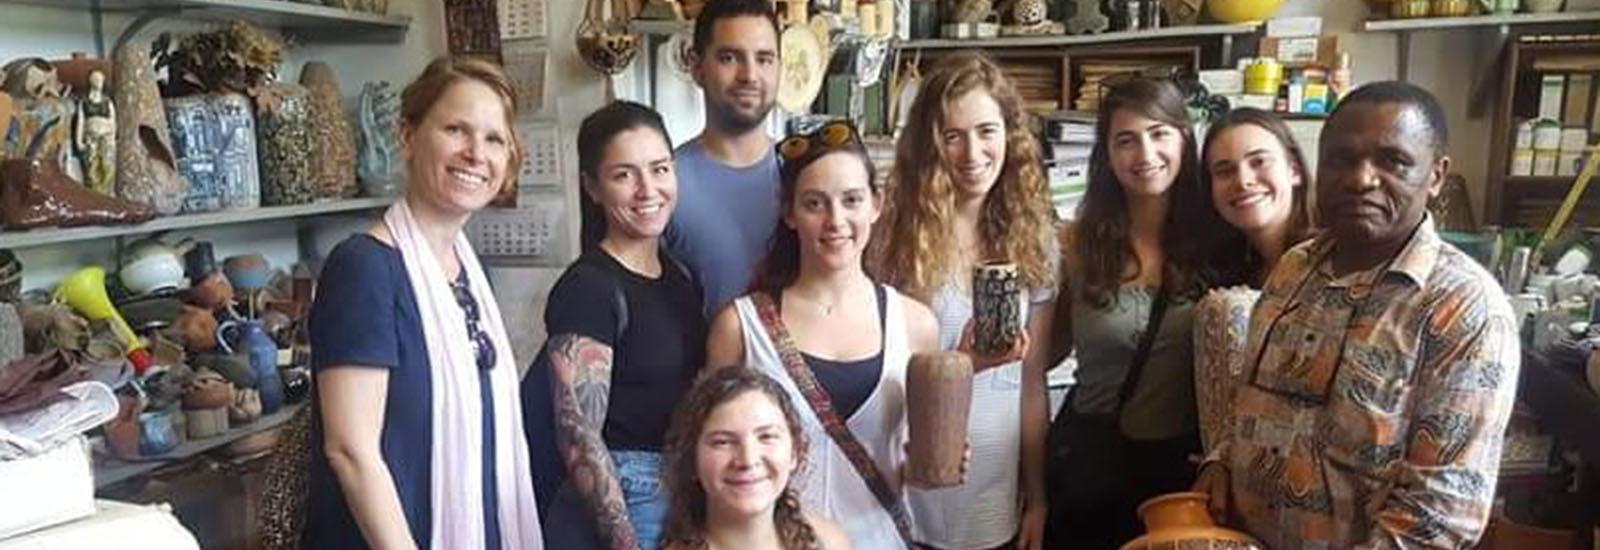 MTSIFA hosts Professors from Bezalel Academy-Jerusalem for Ceramics Workshop